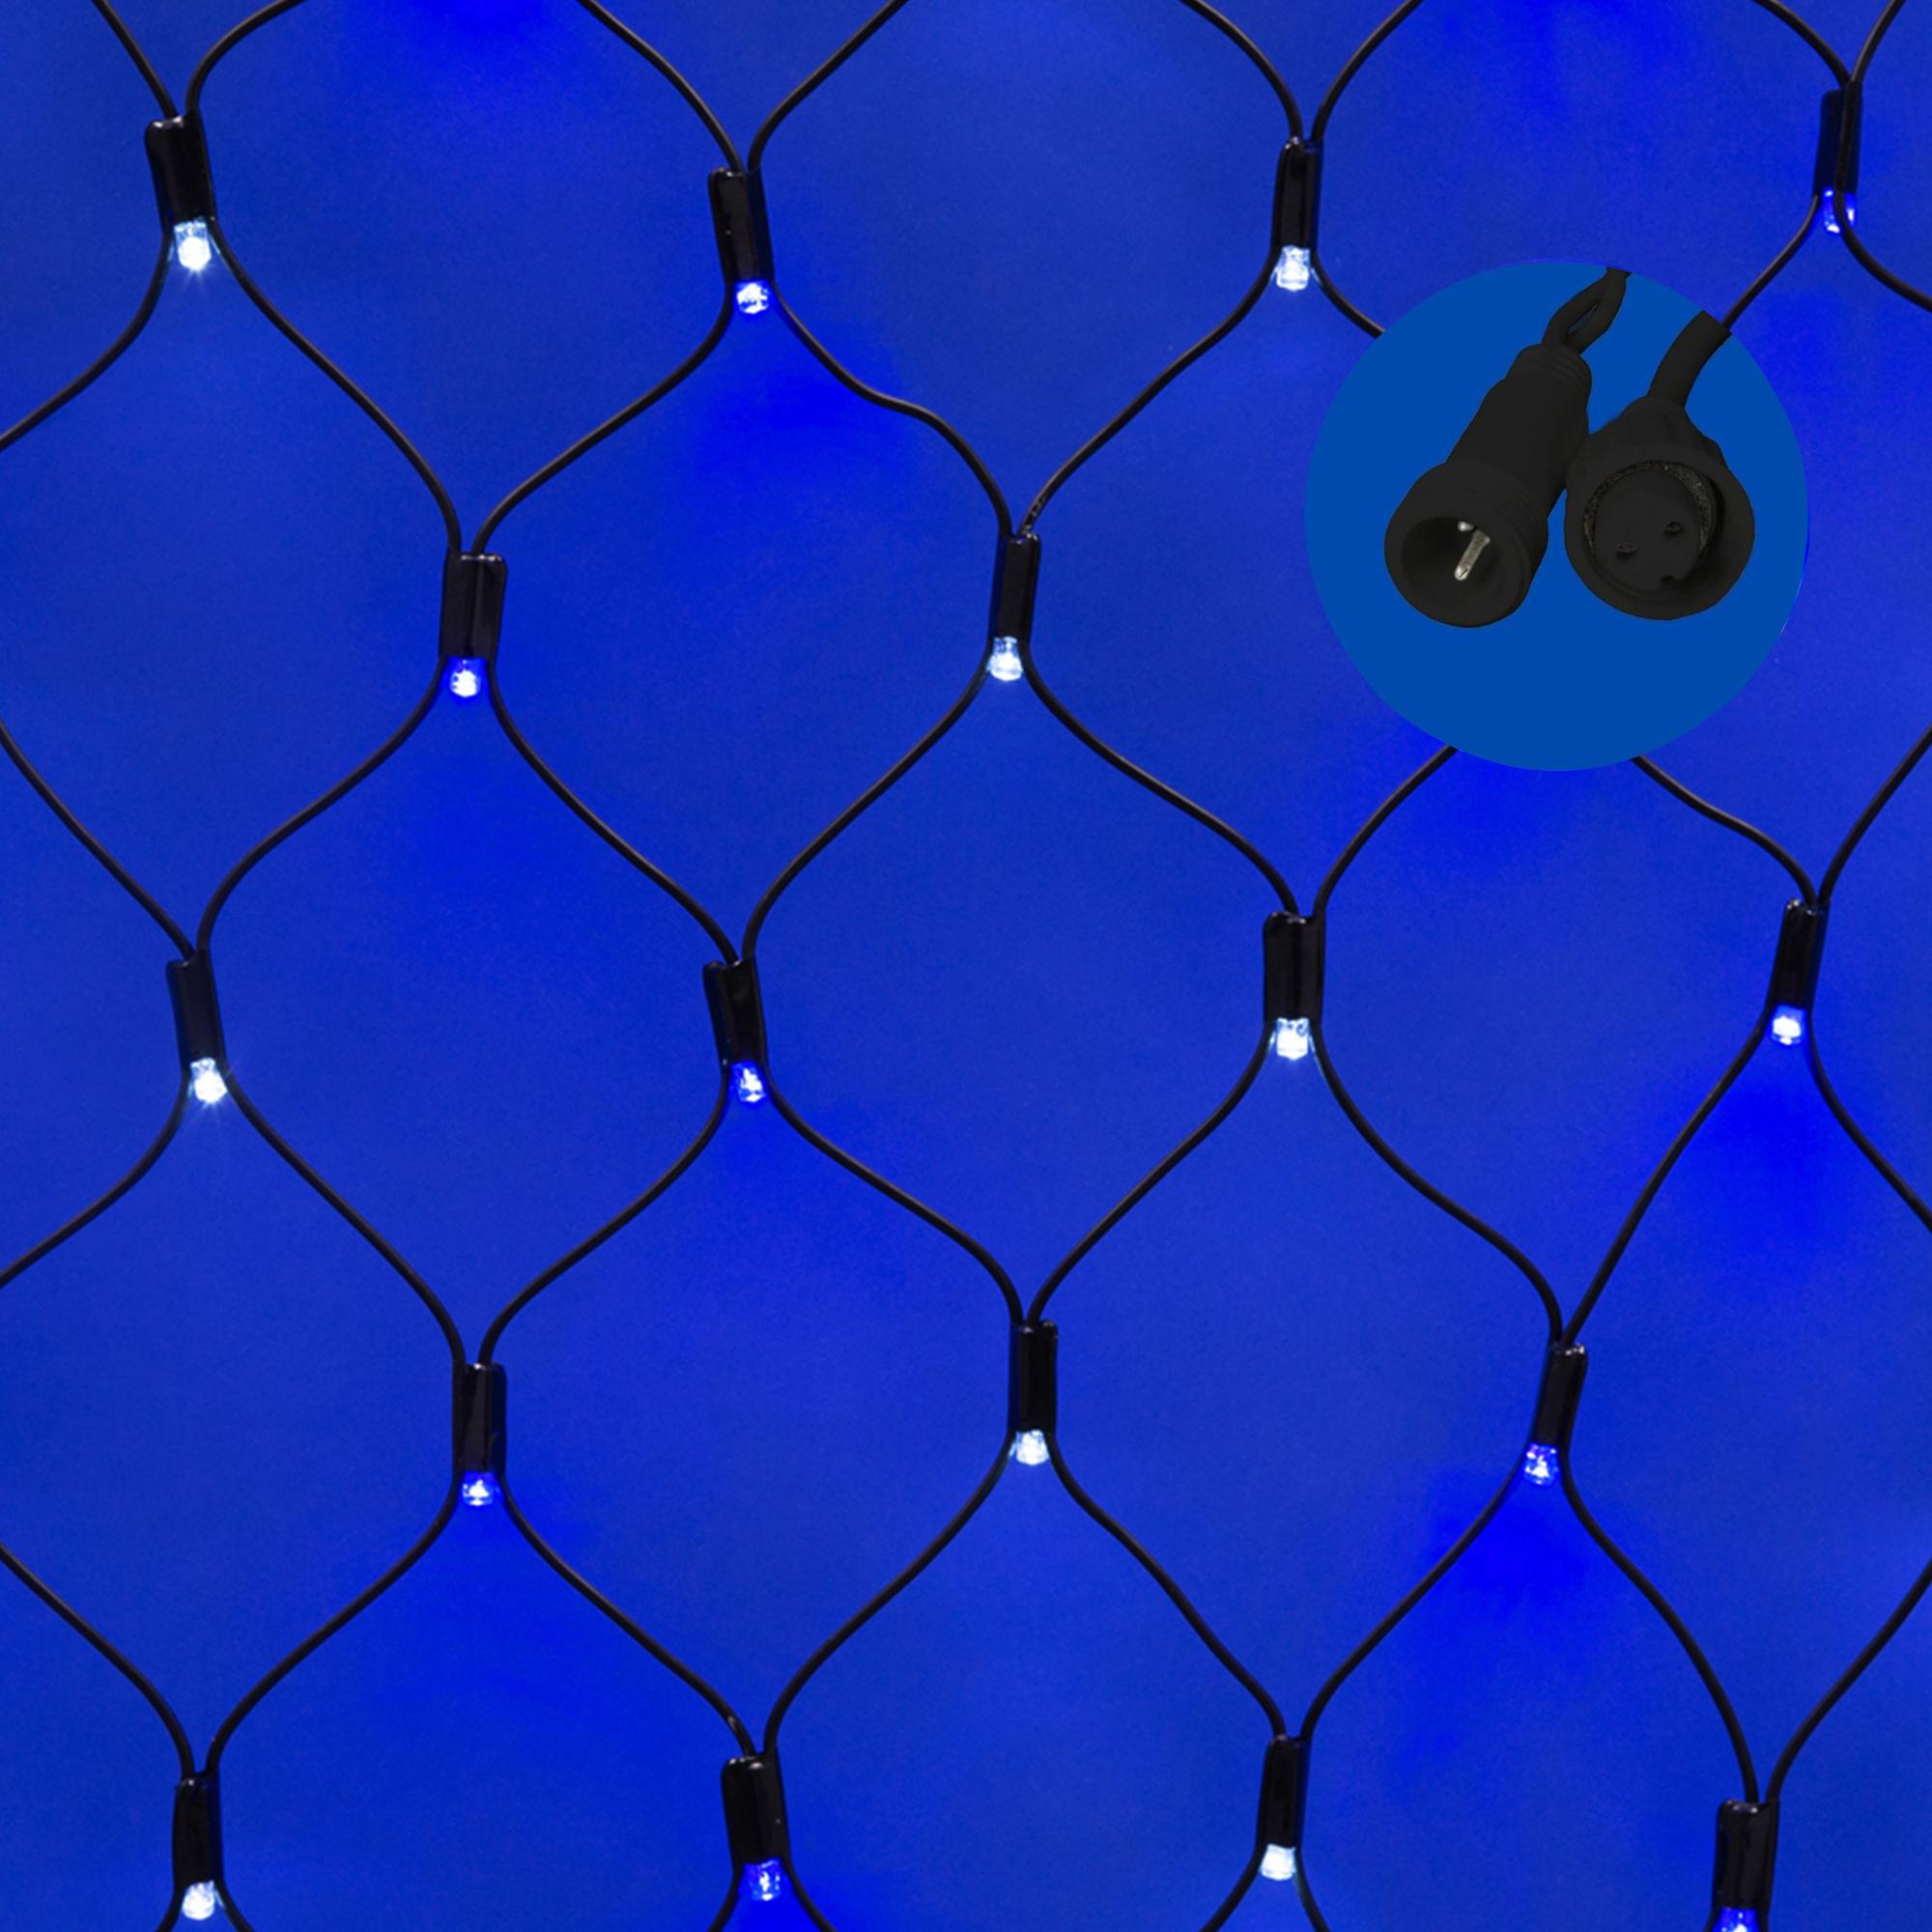 ULD-N2015-288/SBK WHITE-BLUE IP67